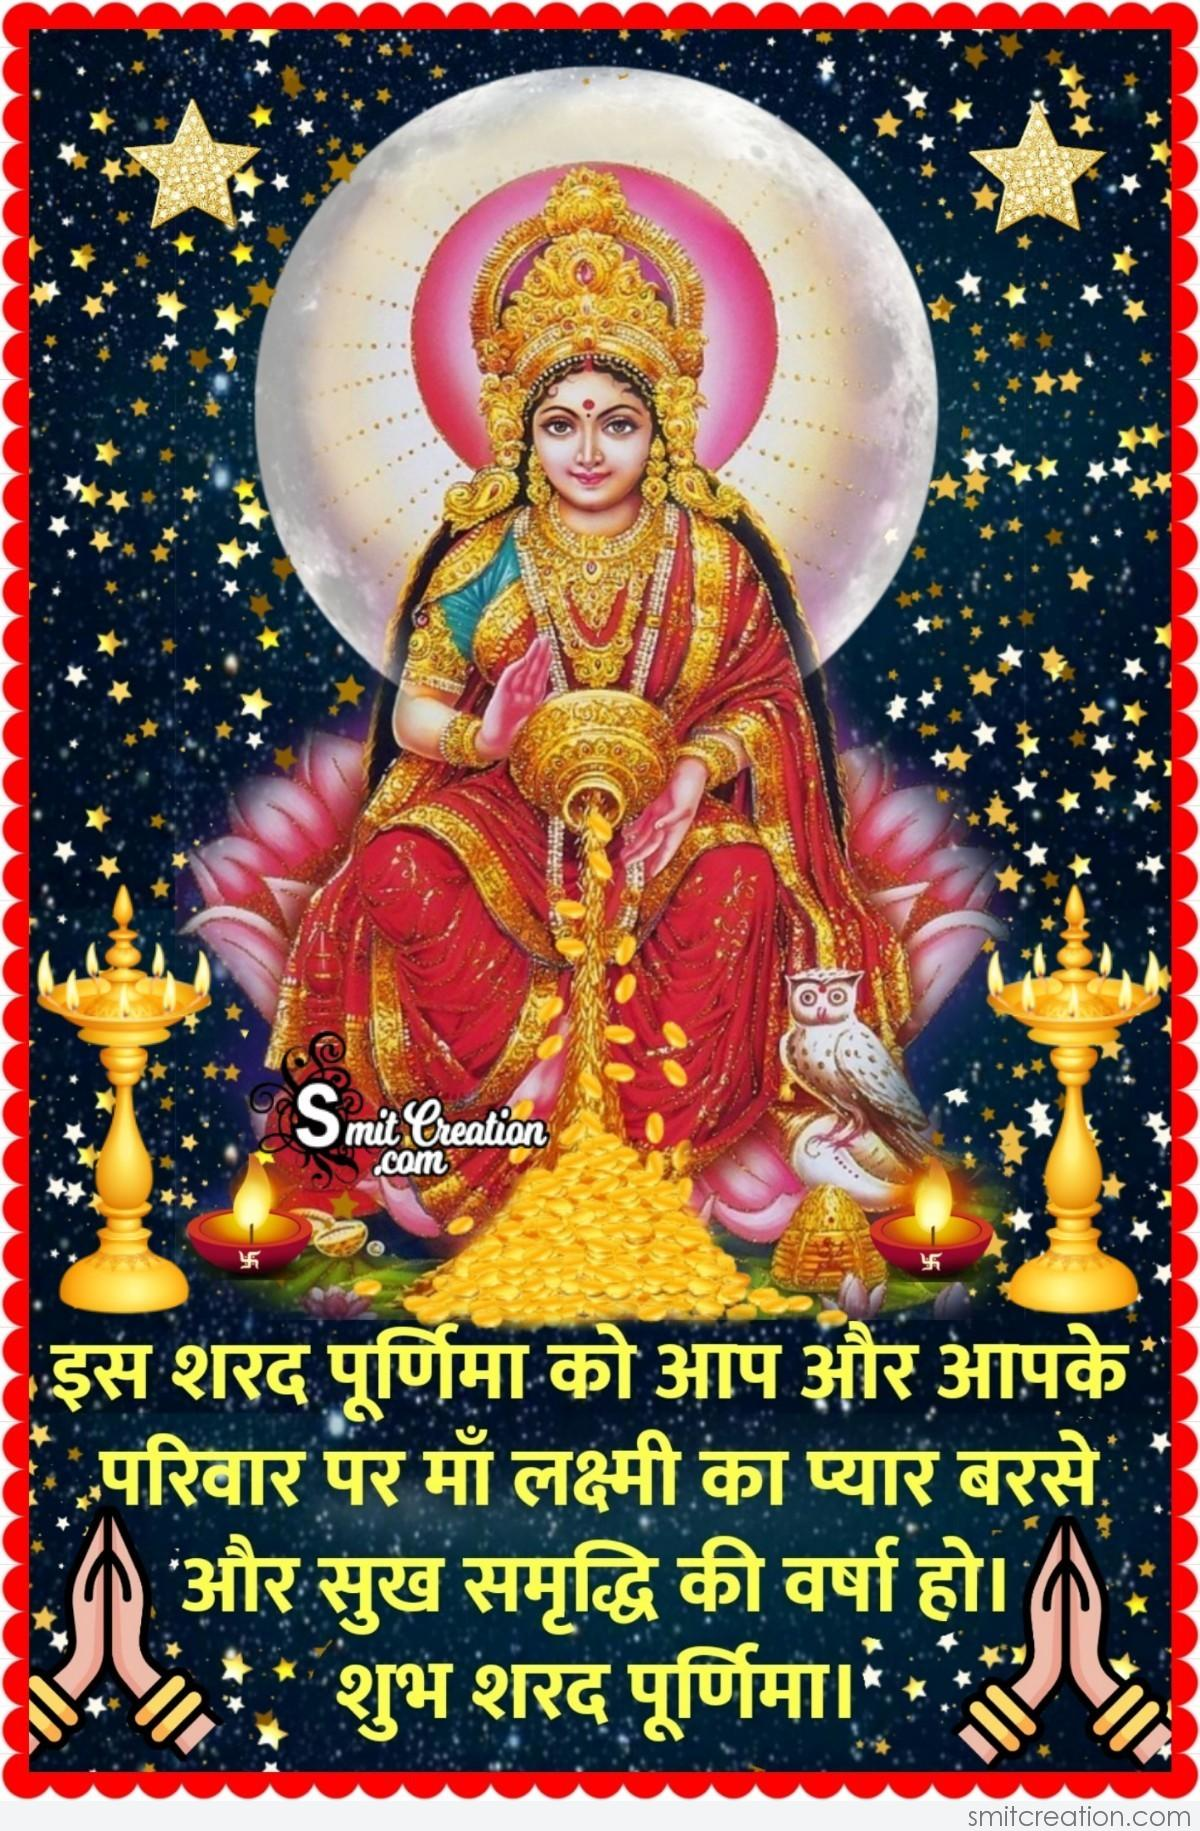 Sharad Purnima Wishes Quote In Hindi - SmitCreation.com